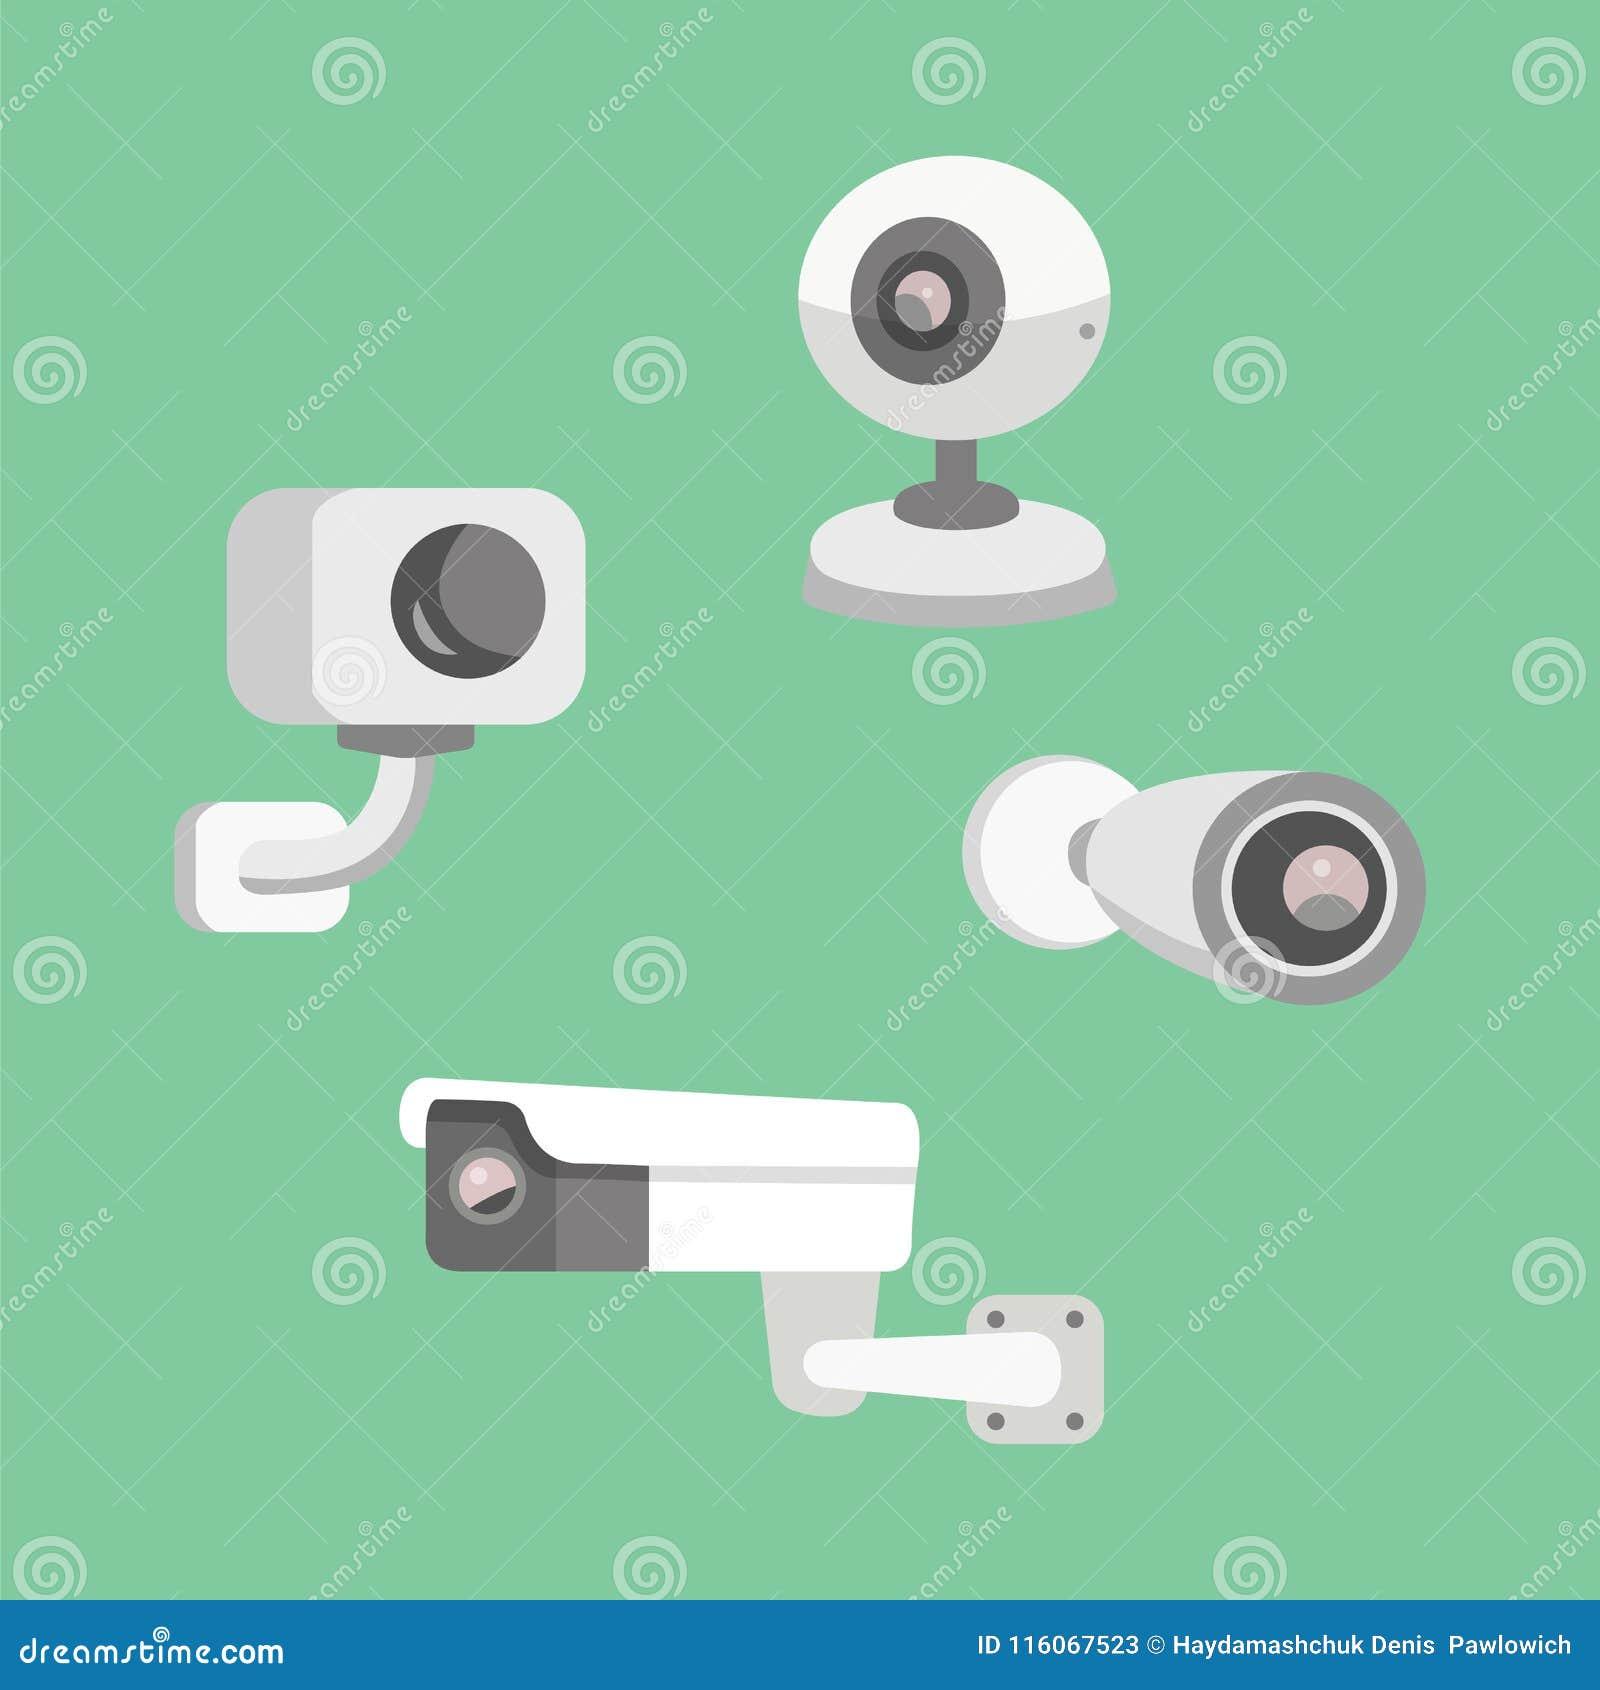 Vector Set Security Camera Cctv Cartoon Illustration Safety And